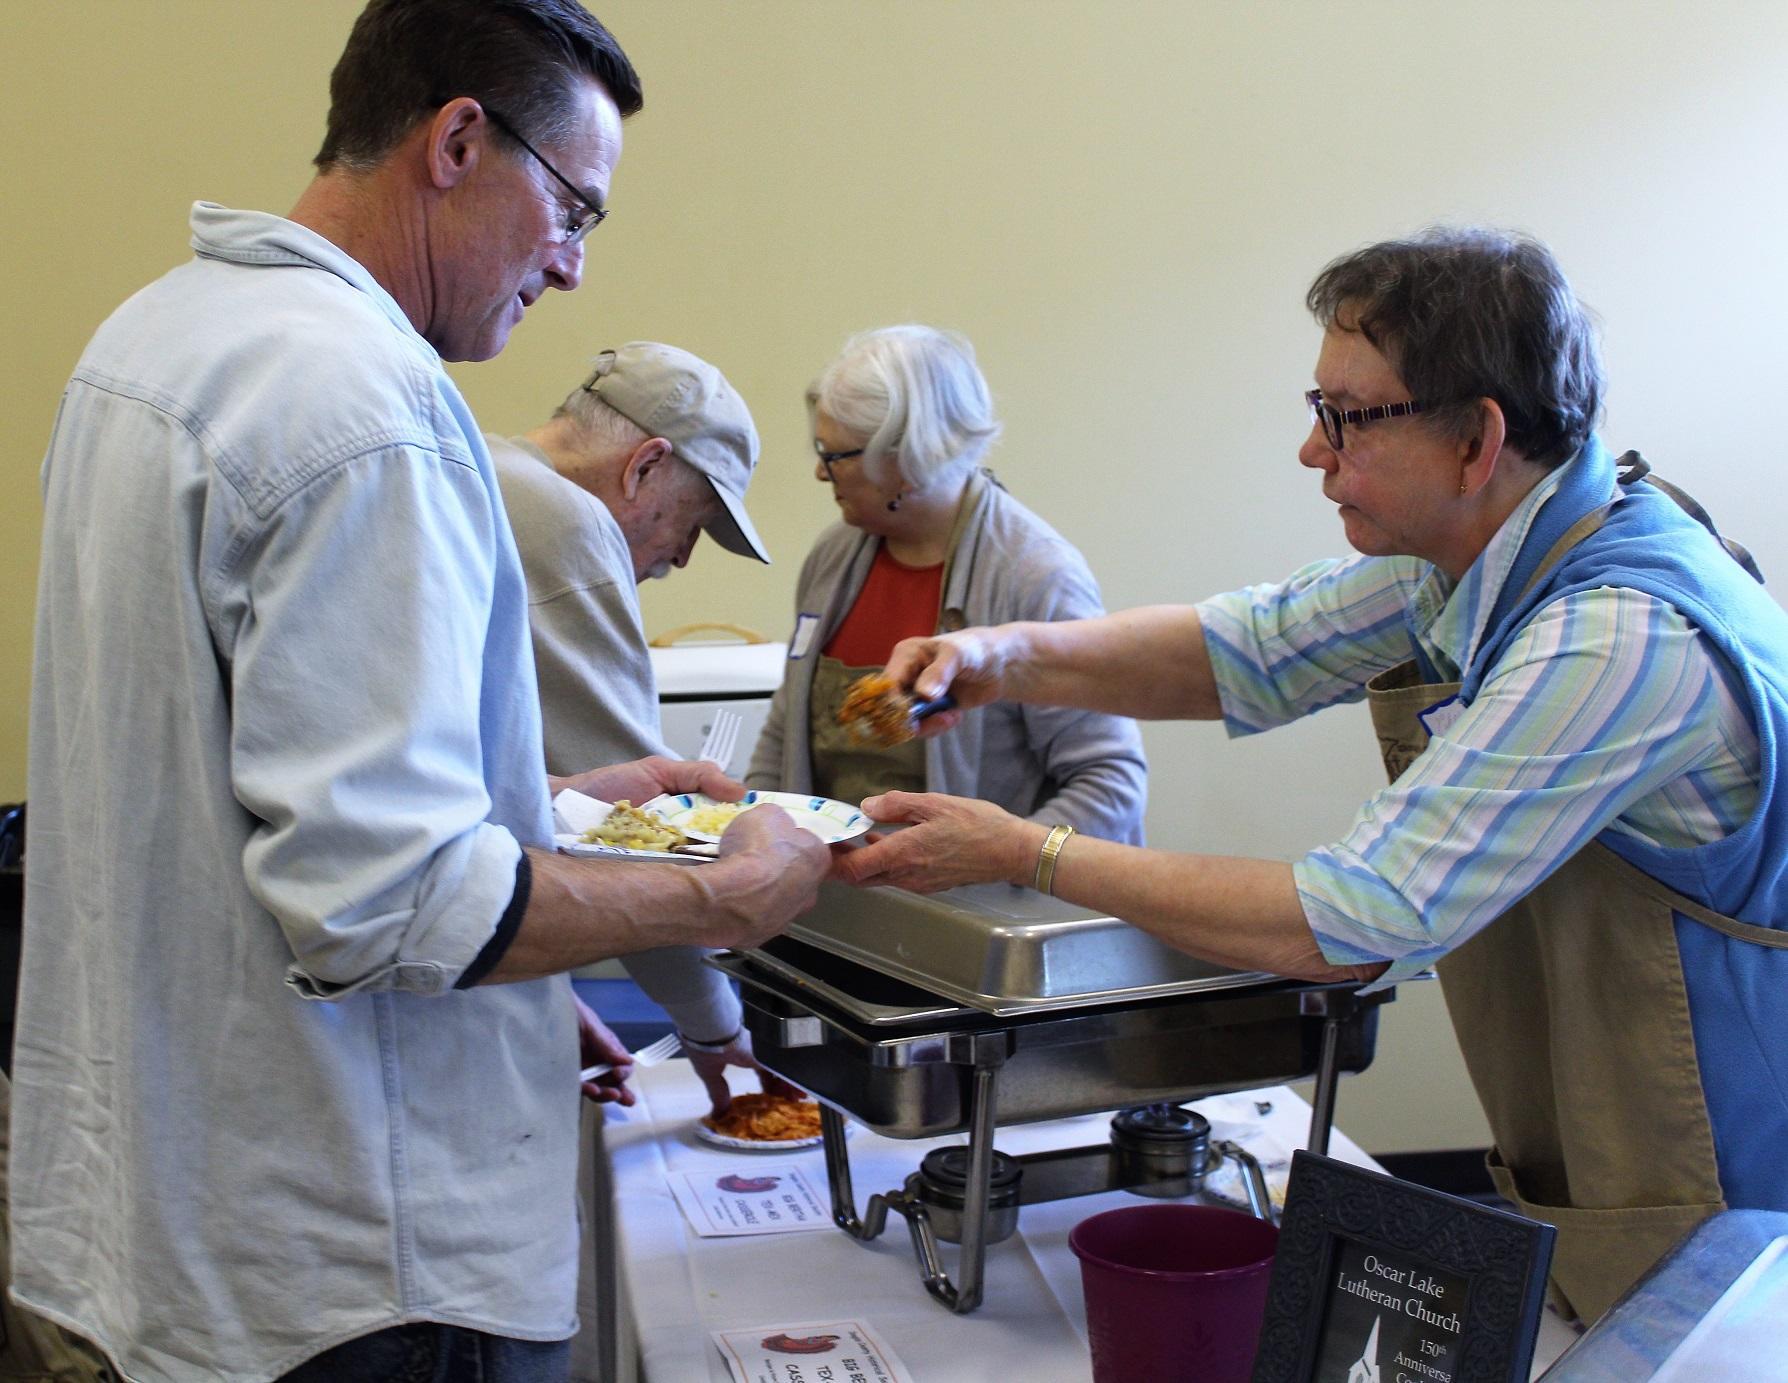 Char Hanson, a volunteer from the Douglas County Historical Society, serves hotdish to Wayne Freimuth of Miltona. The Big Bertha Tex-Mex Casserole, as it was labeled, came from the Oscar Lake Church cookbook. (Celeste Edenloff / Echo Press)